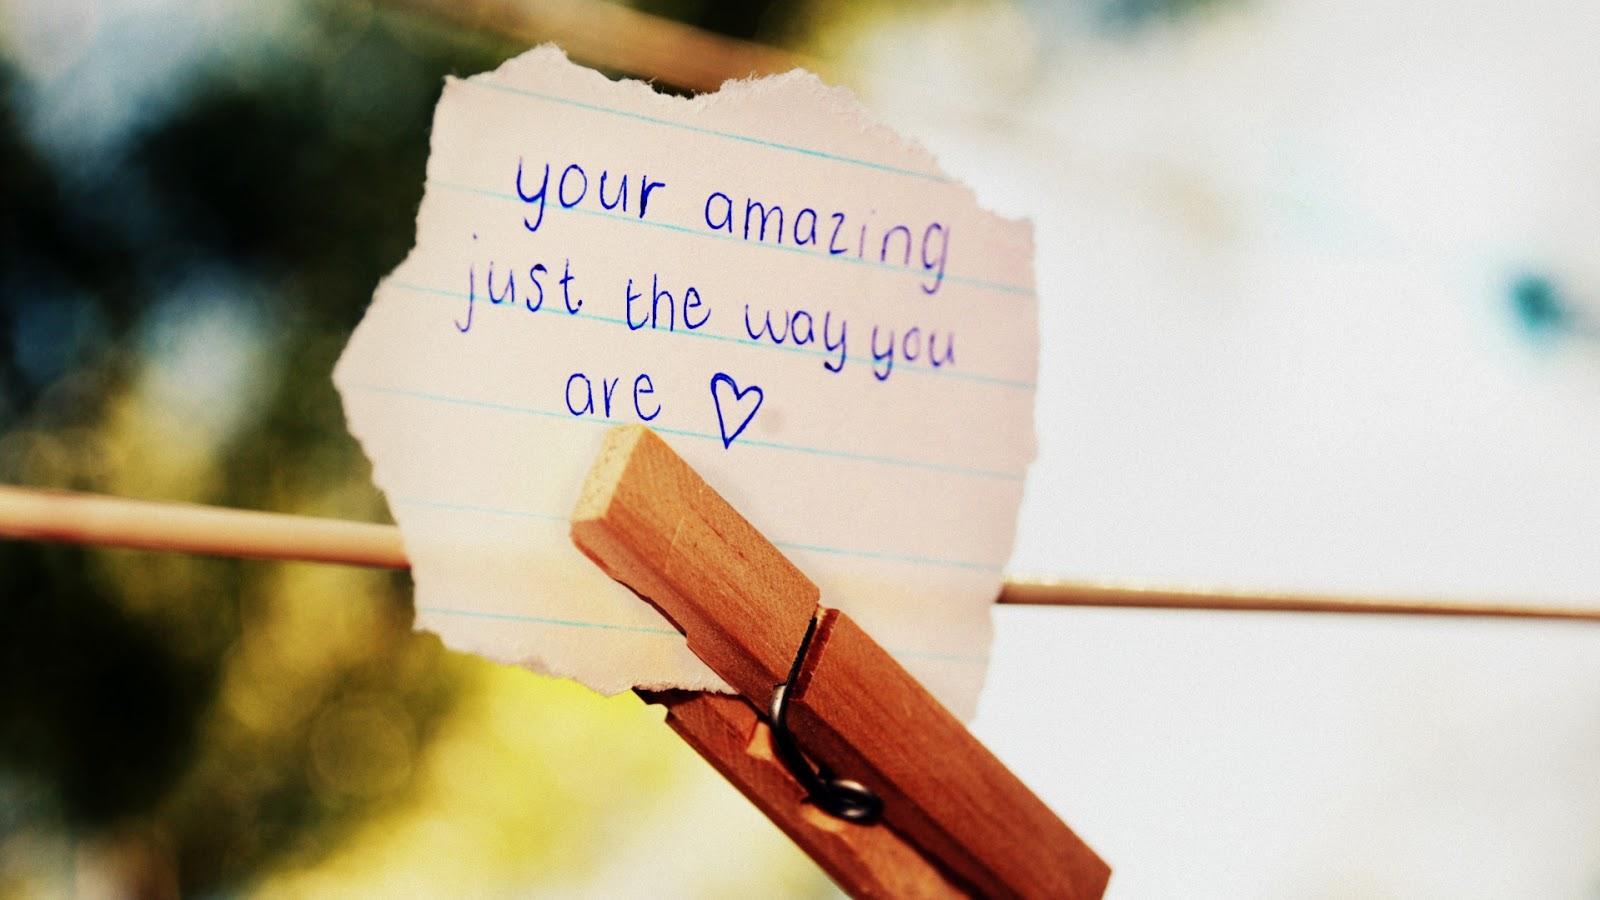 Best Love Quotes Images HD Wallpaper of Love   hdwallpaper2013com 1600x900